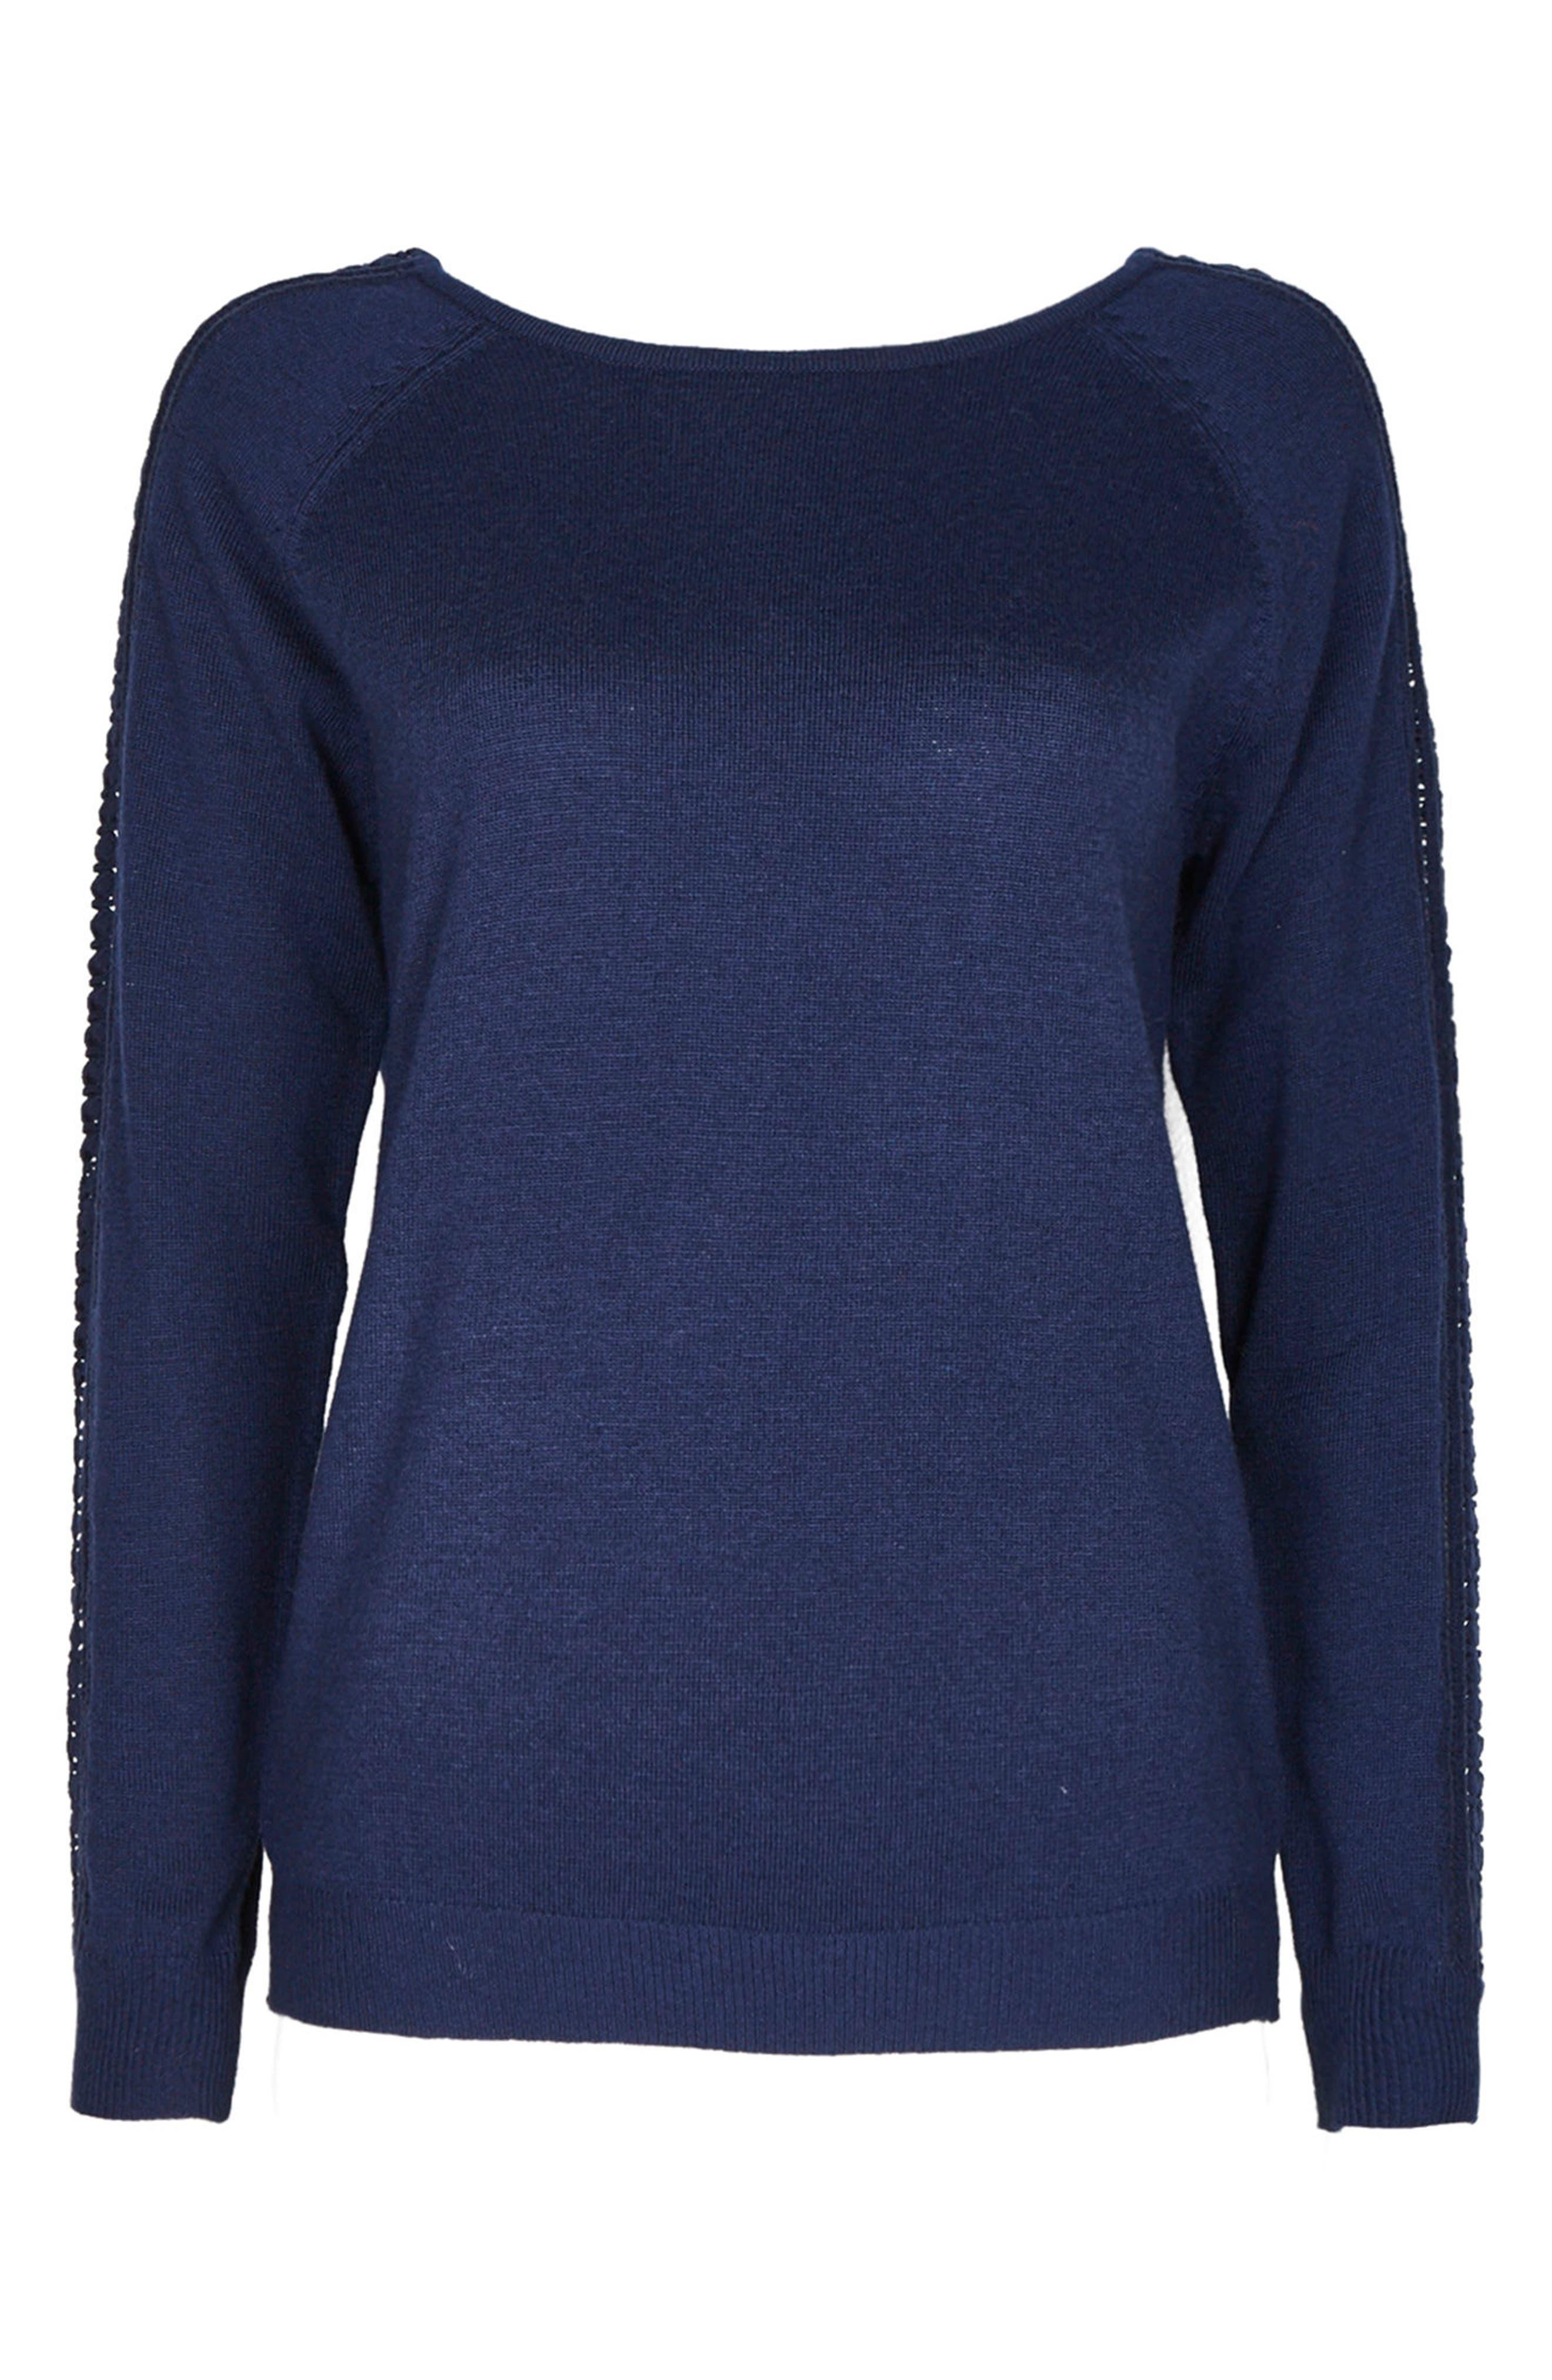 Wallis Lace Trim Sweater